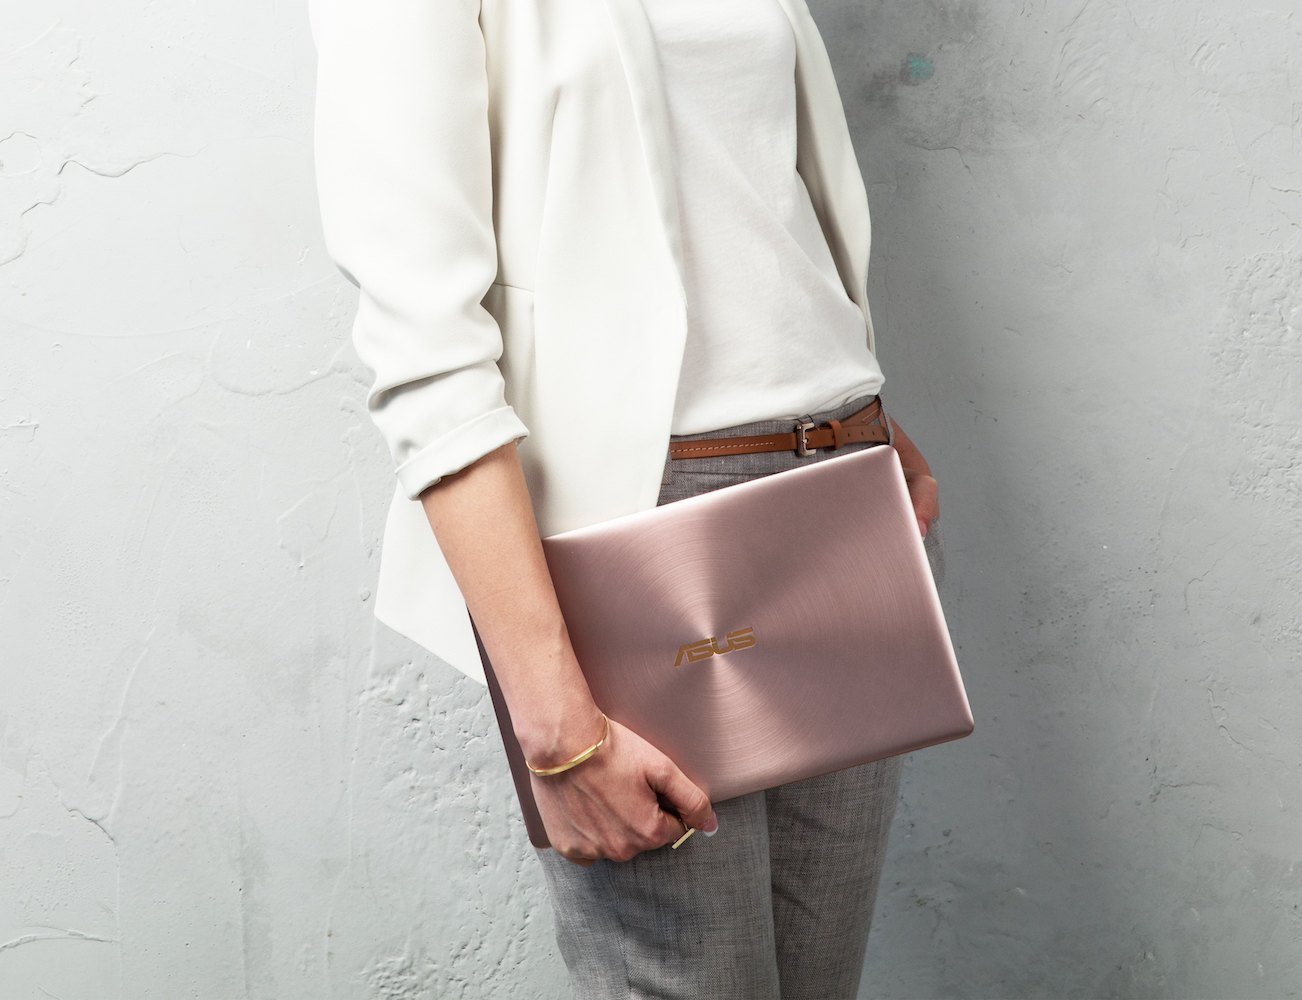 asus-zenbook-3-laptop-01